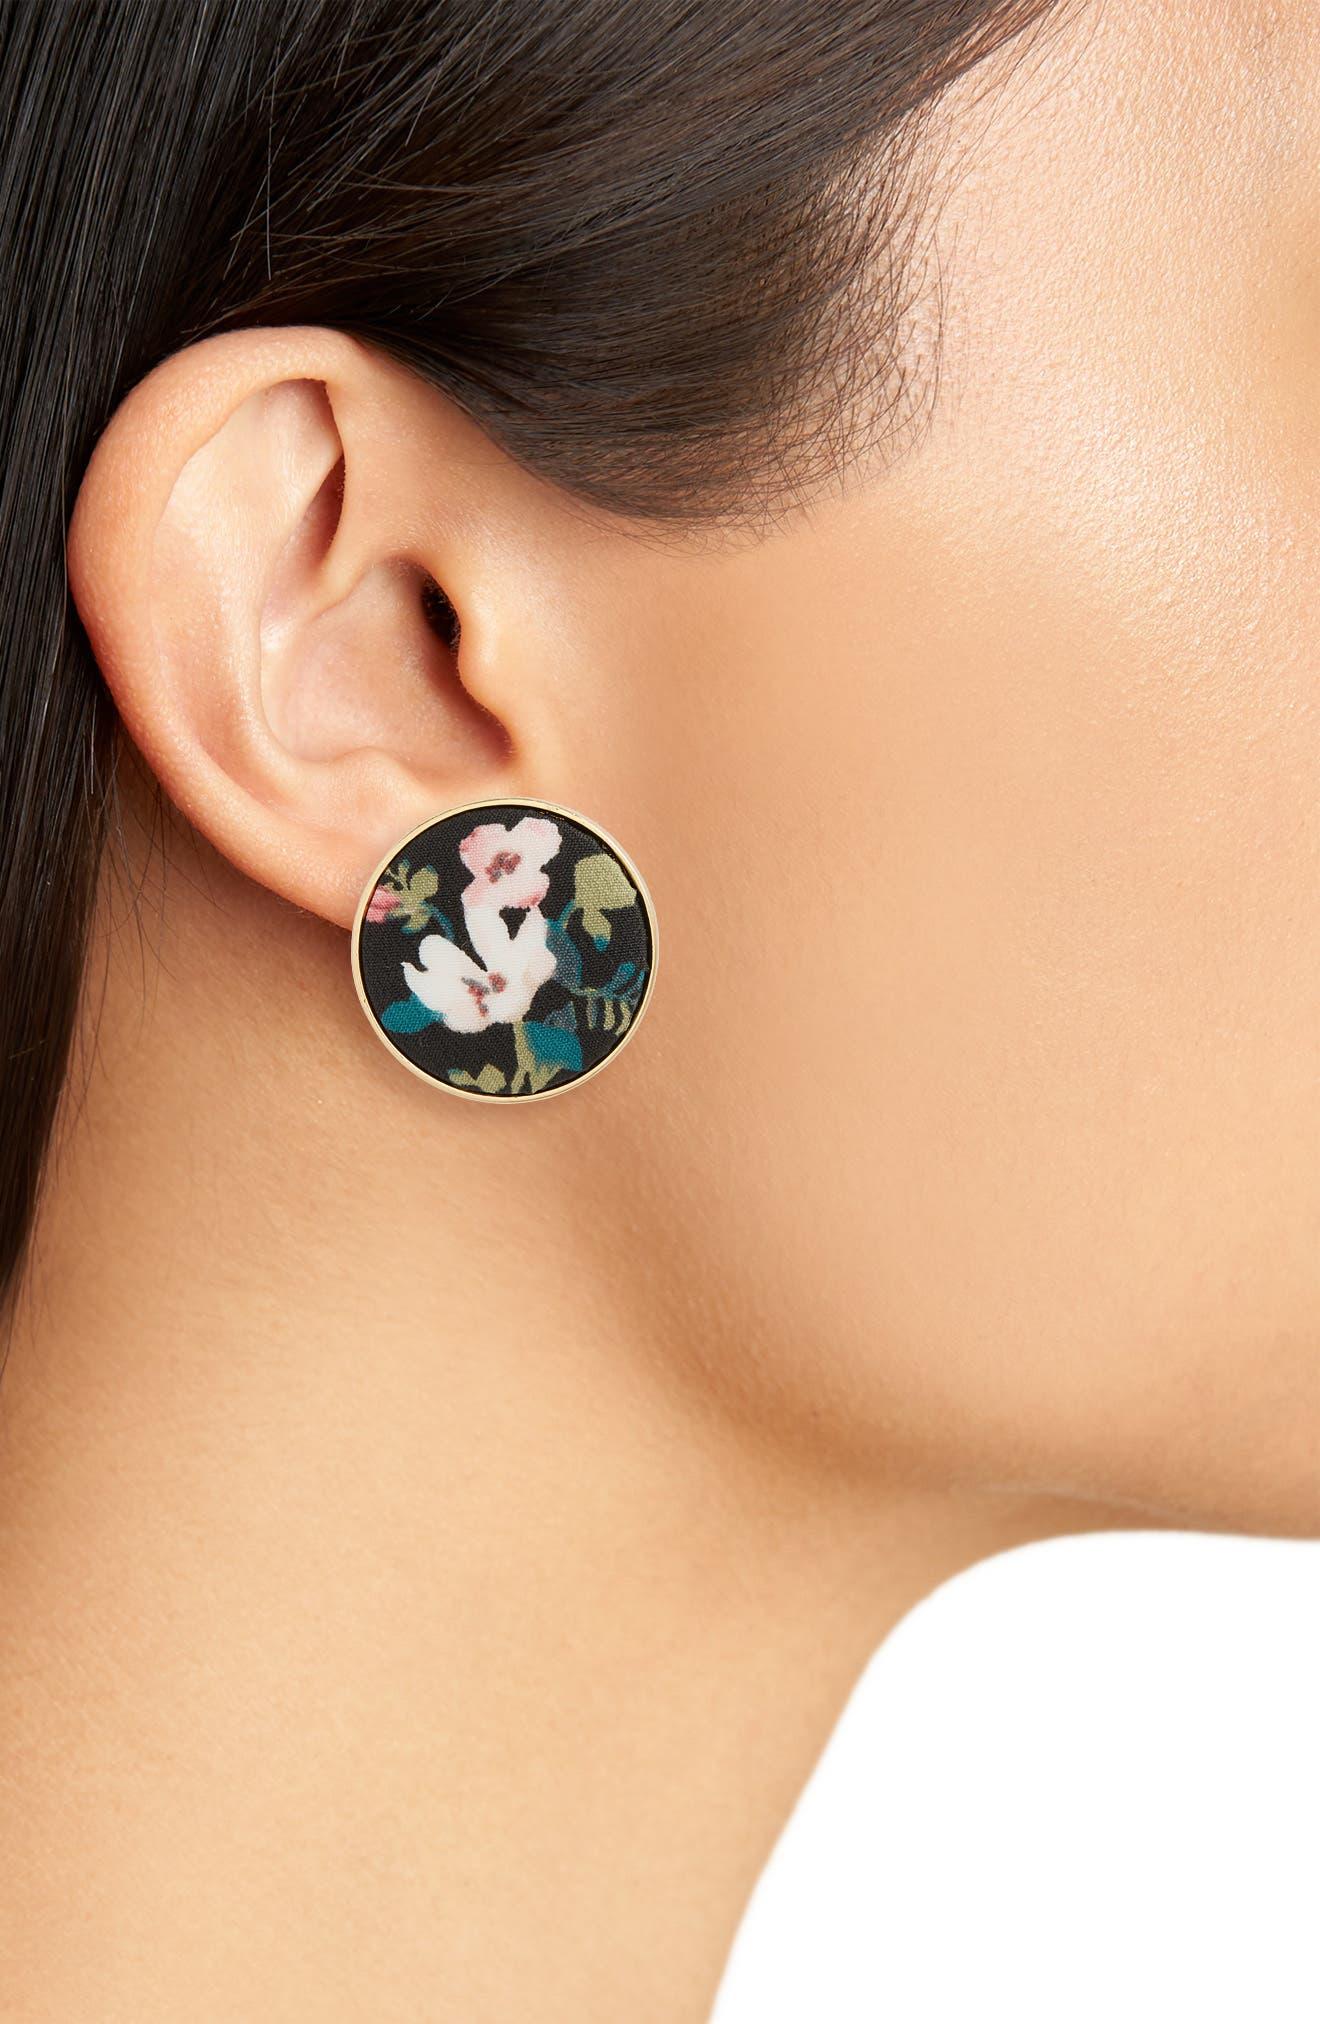 kate spade set sail button stud earrings,                             Alternate thumbnail 2, color,                             001